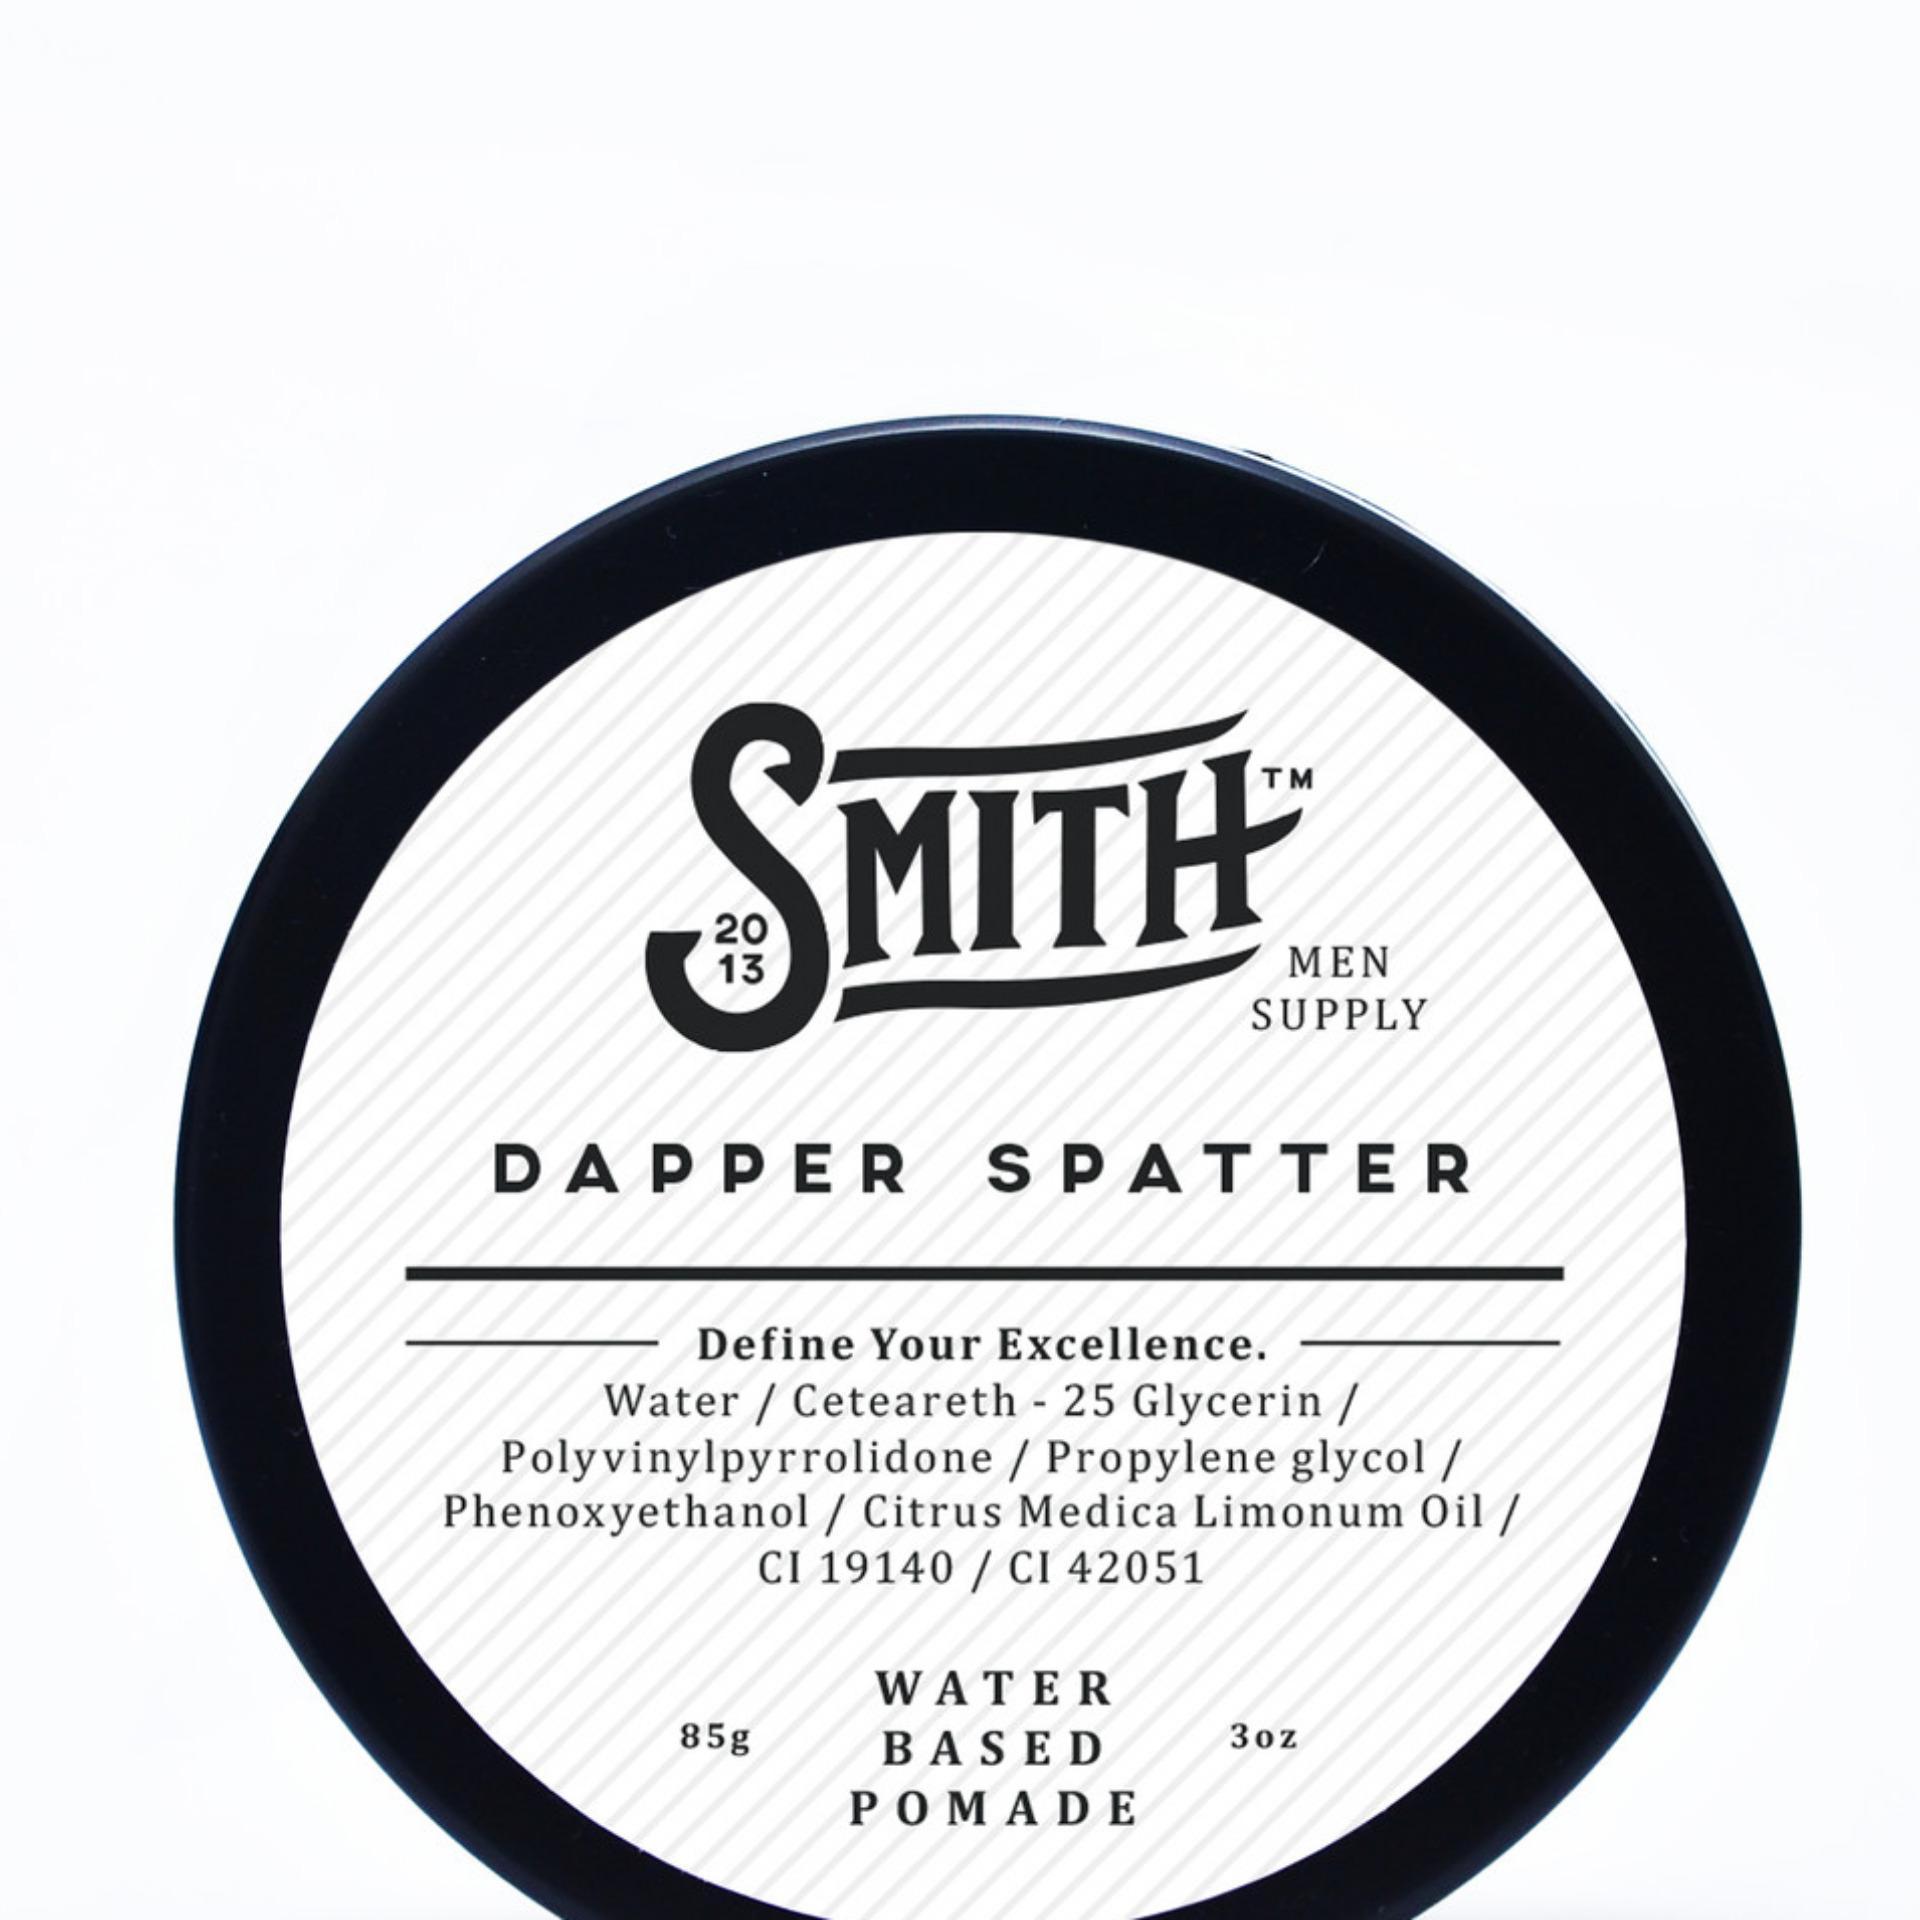 Jual Pomade Smith Dapper Spatter Waterbased 3 Oz Online Di Dki Jakarta